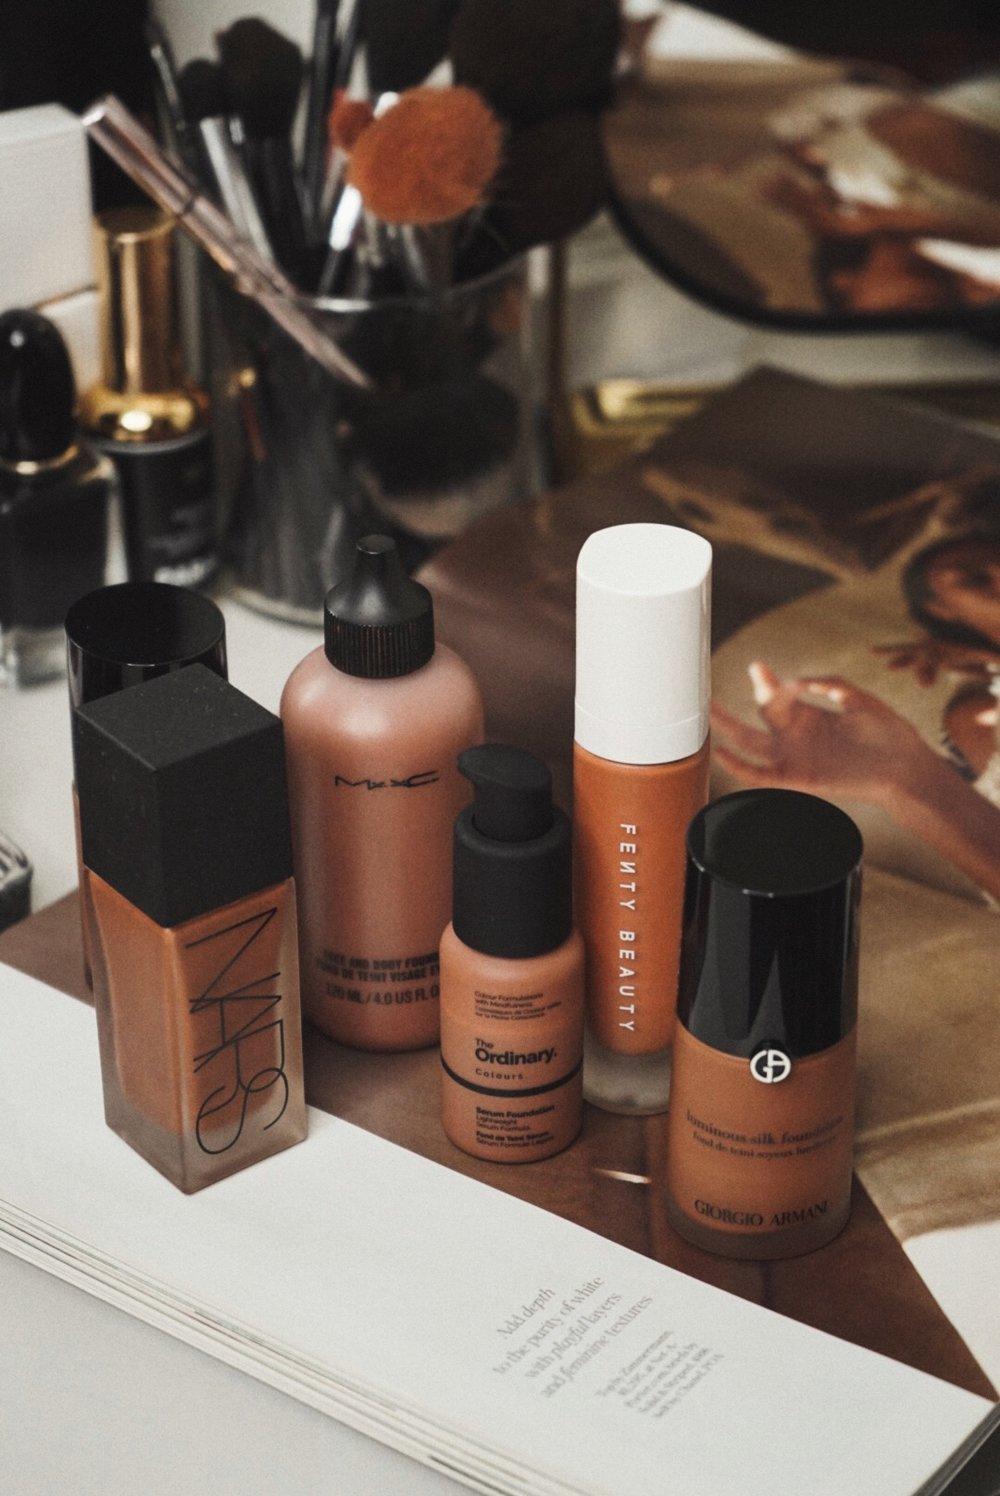 TashaJames-TheGlossier-Top-Foundations-Makeup-26.JPG